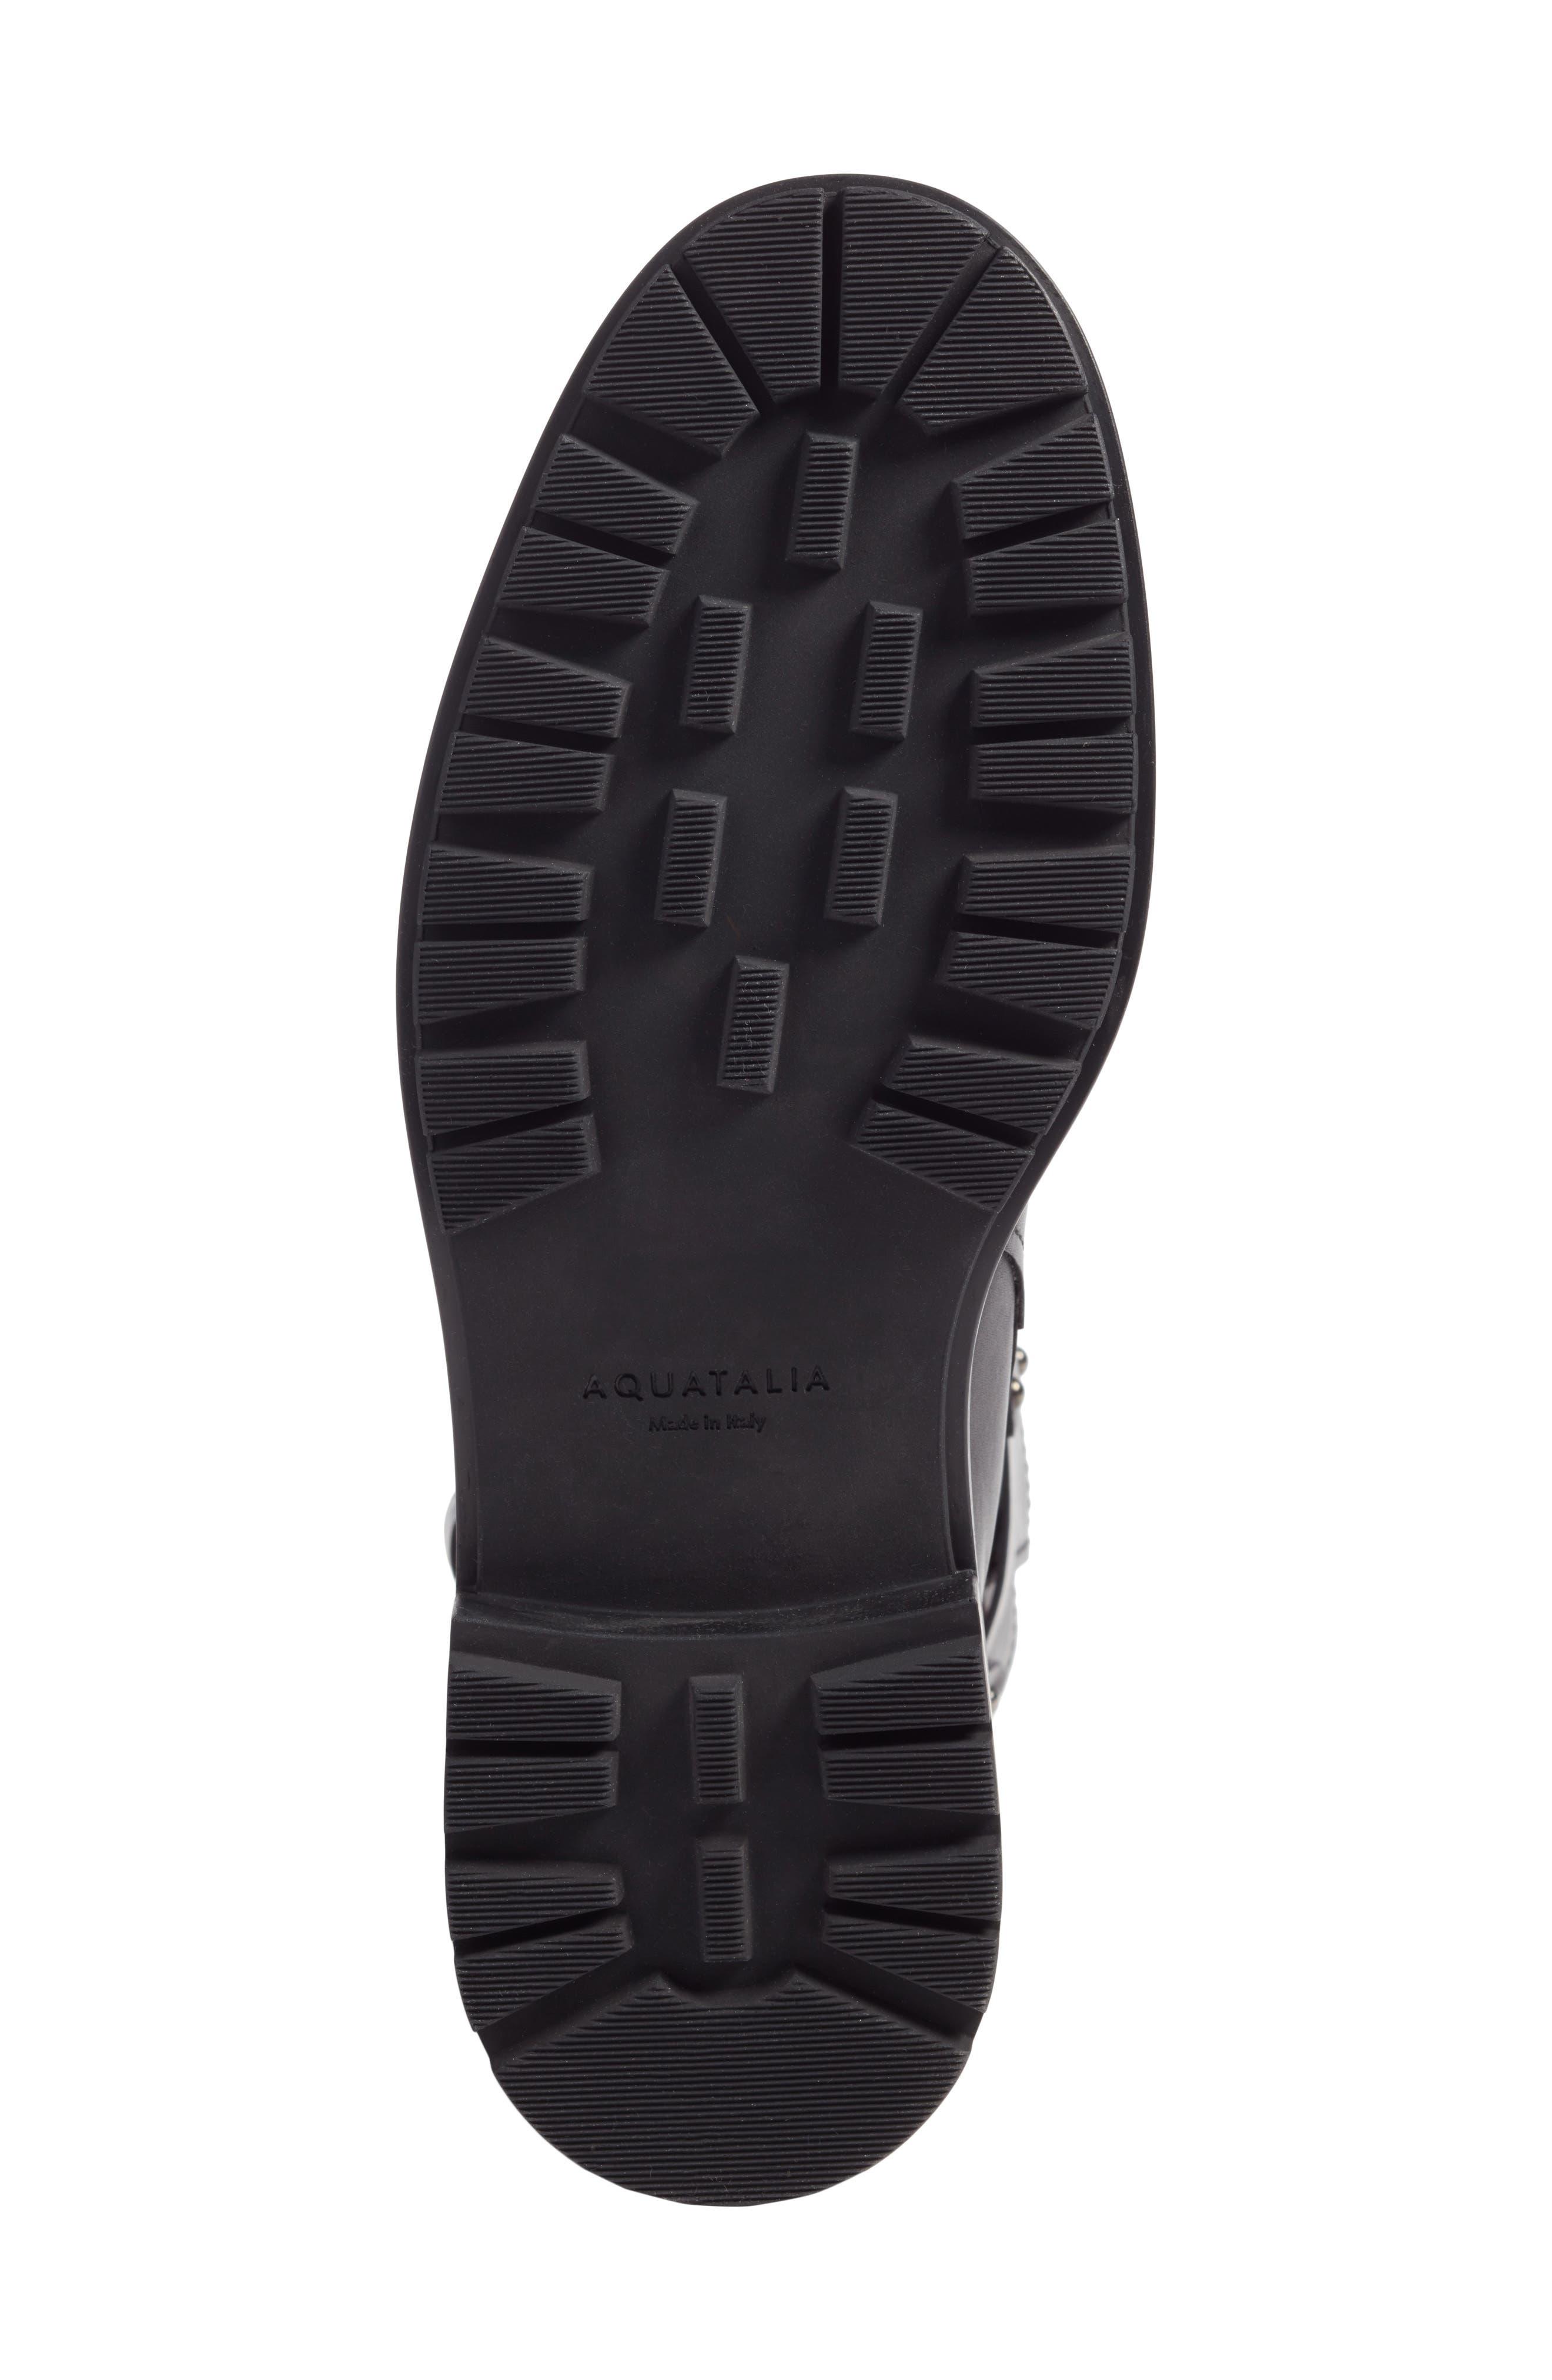 Leonie Weatherproof Leather Boot,                             Alternate thumbnail 7, color,                             Black Calf